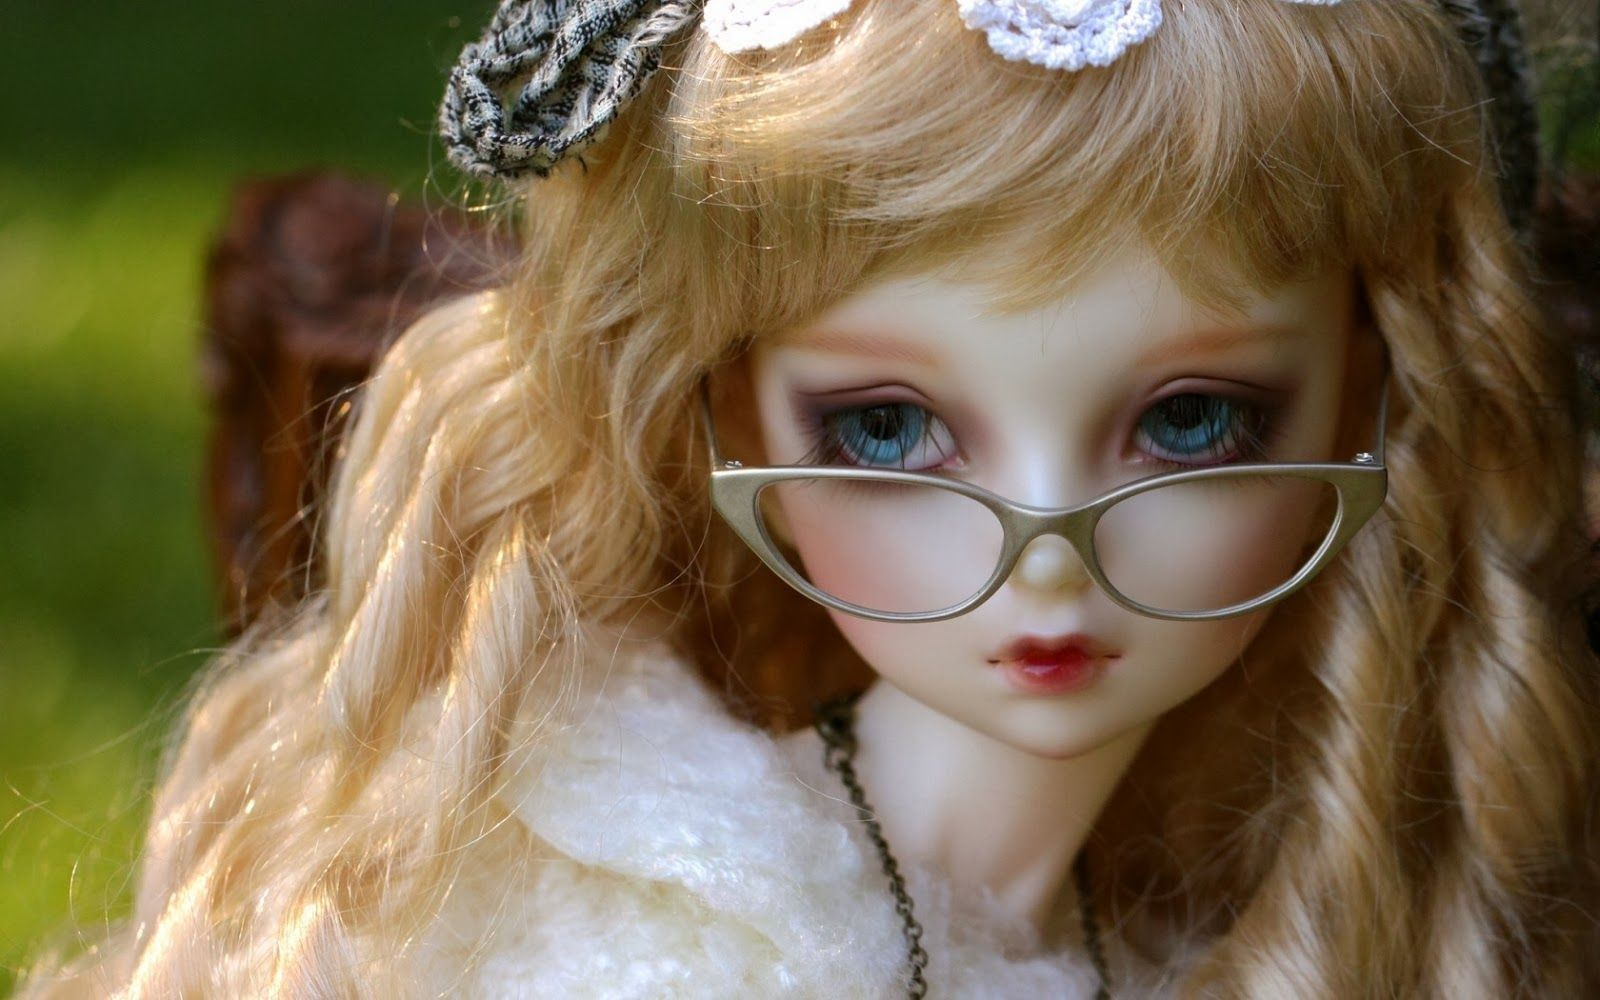 Pretty Barbie Dolls Wallpapers Beautiful Dolls Beautiful Barbie Dolls Beautiful Profile Pictures Cute doll cute barbie dolls desktop